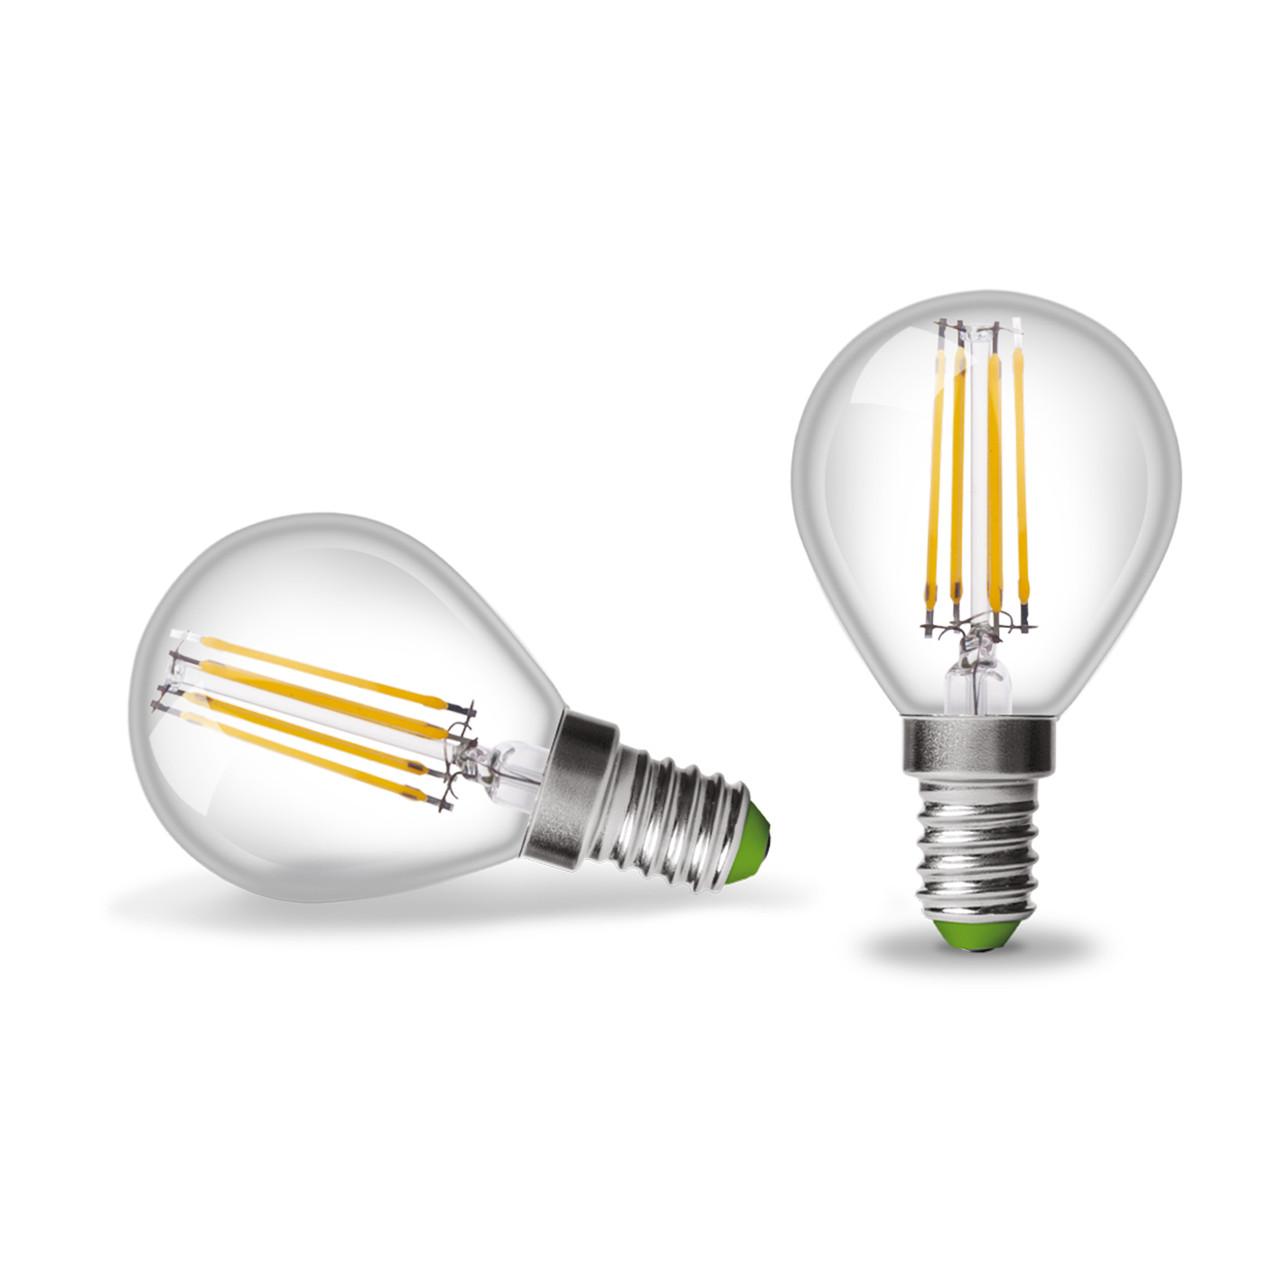 EUROLAMP LED Лампа Шар ArtDeco 4W E14 4000K (прозрачная)